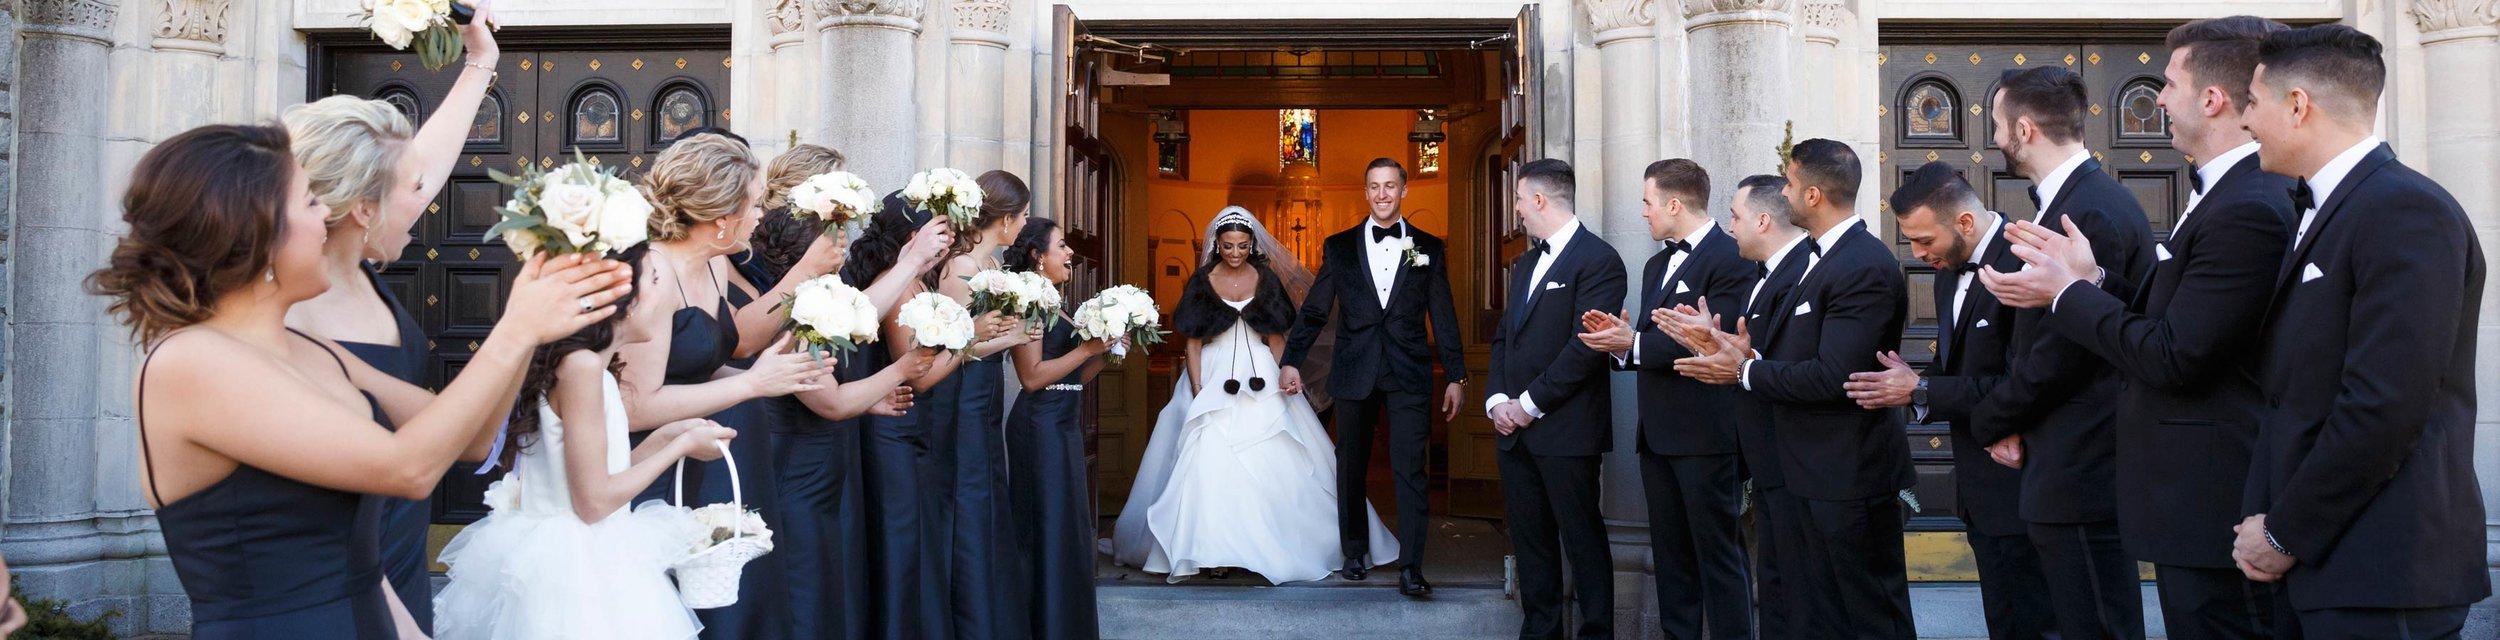 florentine-gardens-wedding-photographer-new-jersey0052.jpg